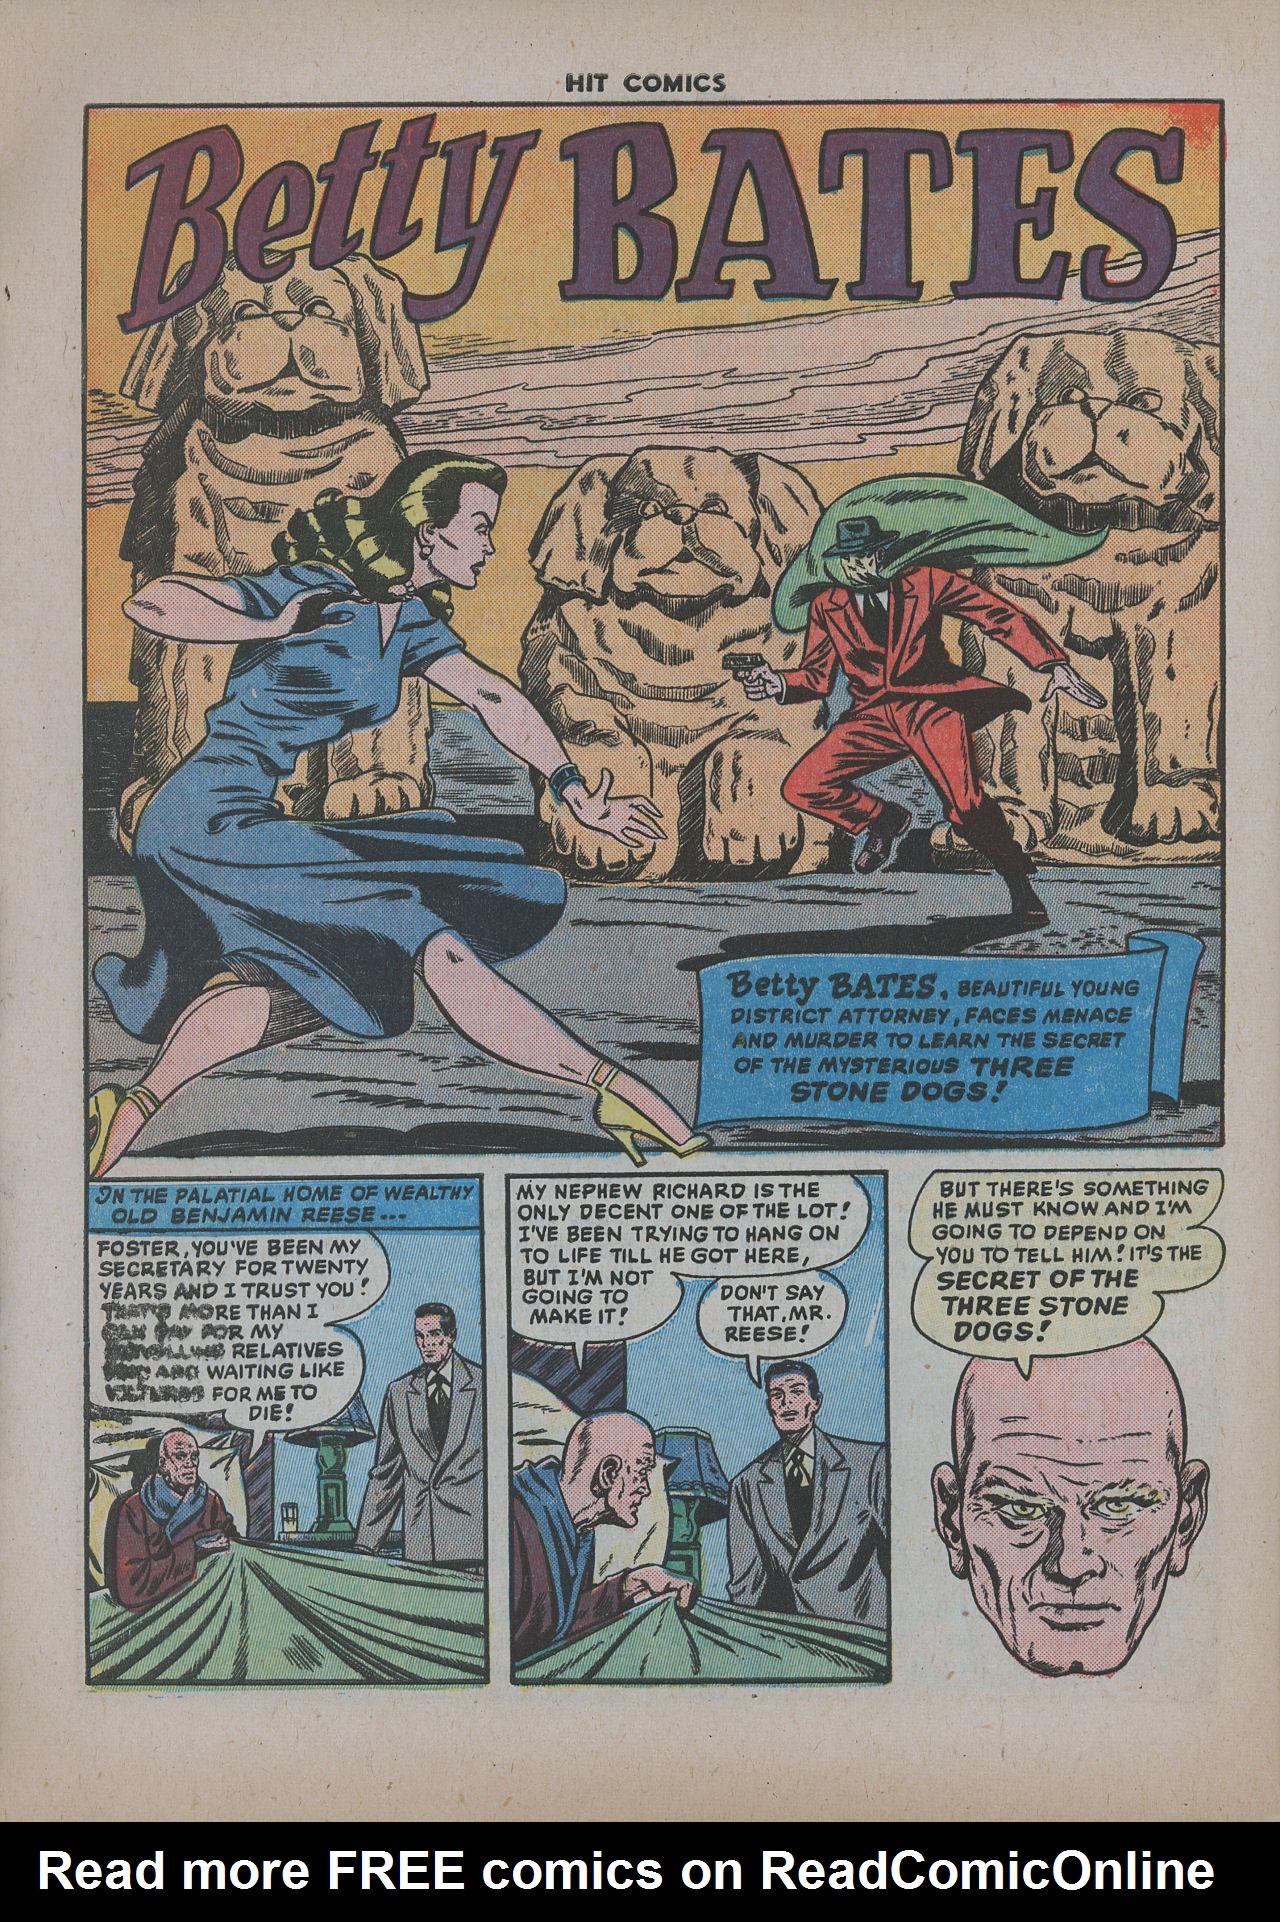 Read online Hit Comics comic -  Issue #62 - 29